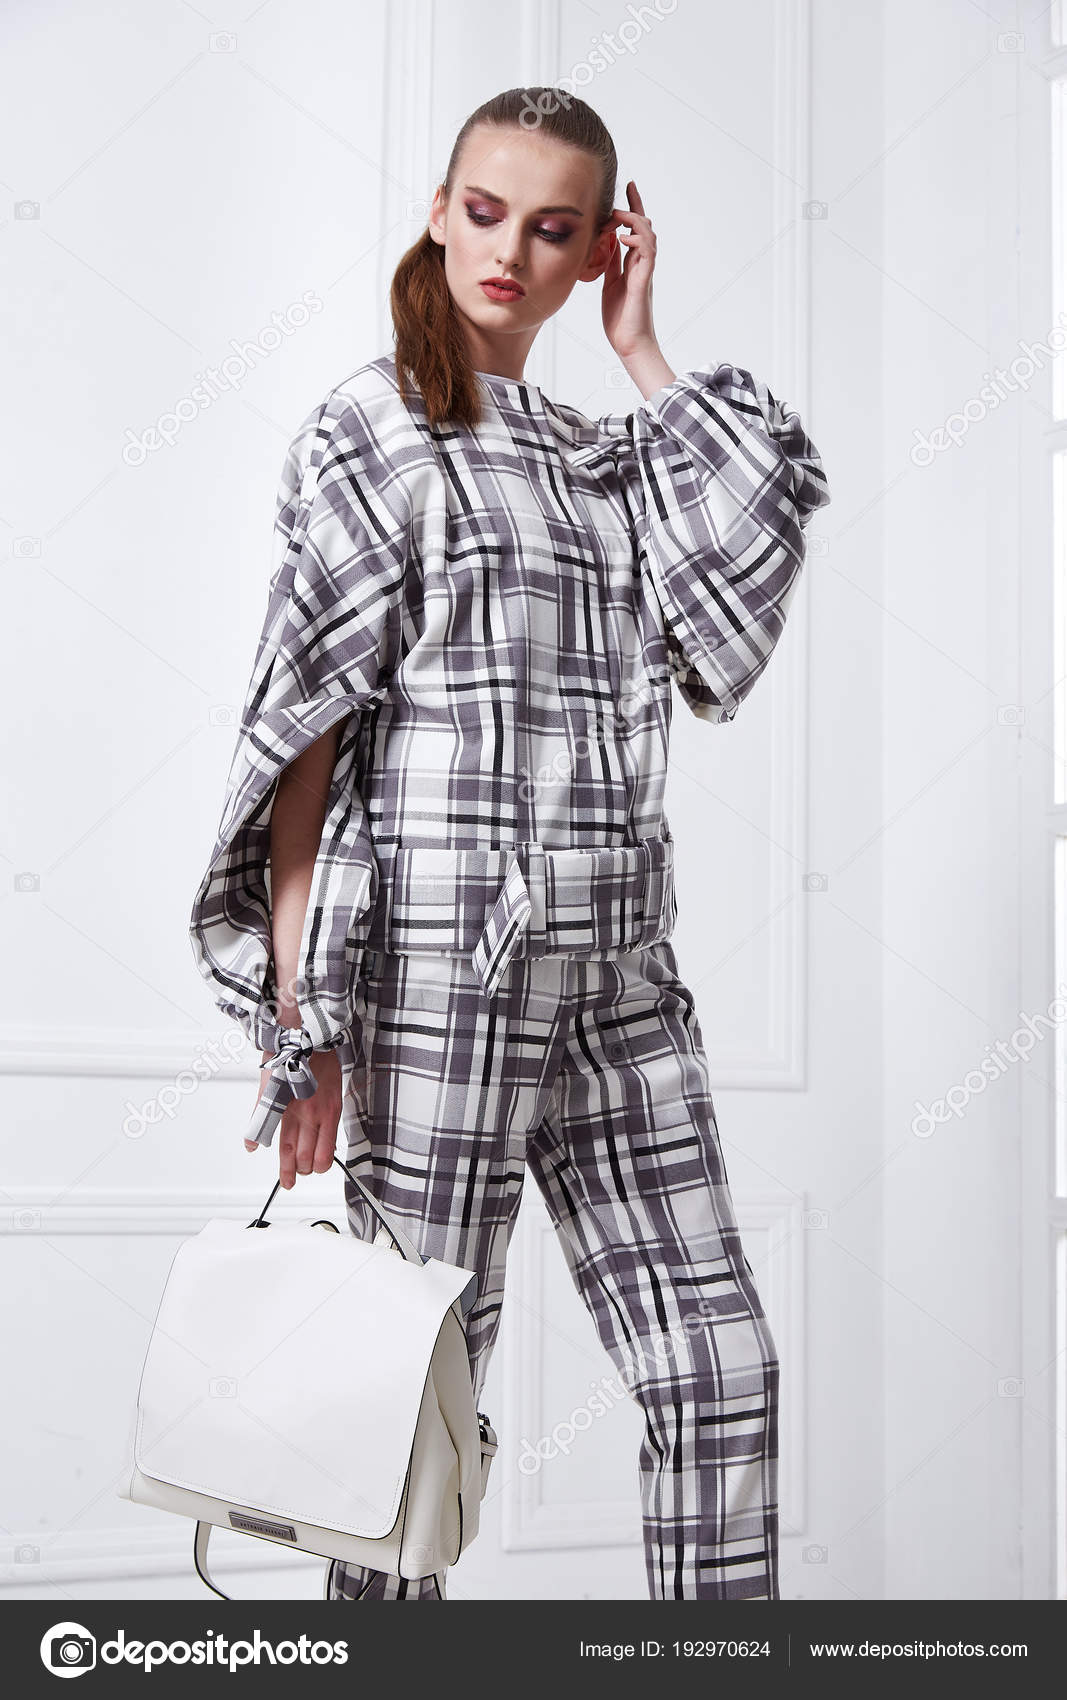 9abd642fec97 ... στυλ ρούχα της μόδας μοντέλο τέλειο πρόσωπο λευκό δωμάτιο τοίχο φθορά  βαμβάκι διαγραμμίσεων κελί κοστούμι μαλλιά glamour ενδυματολογικός κώδικας  ...